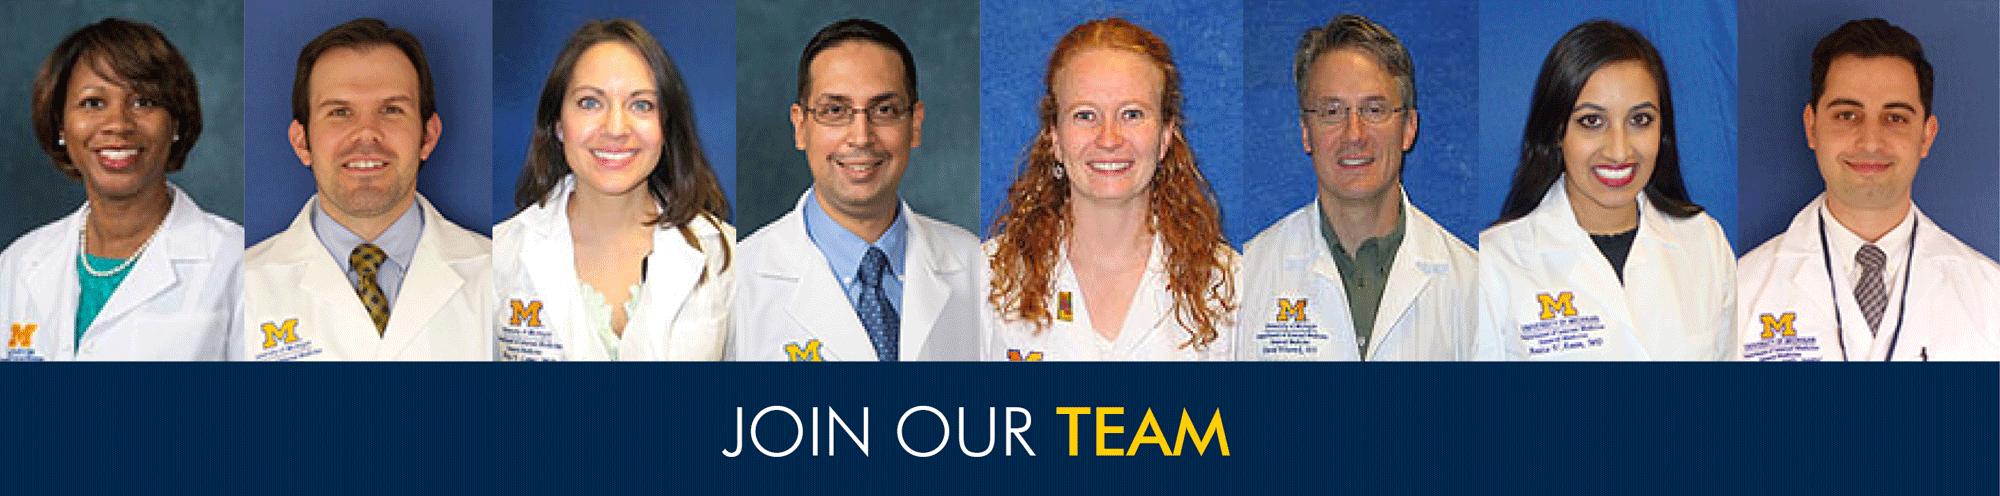 U-M Hospital Medicine Division - Join Our Team